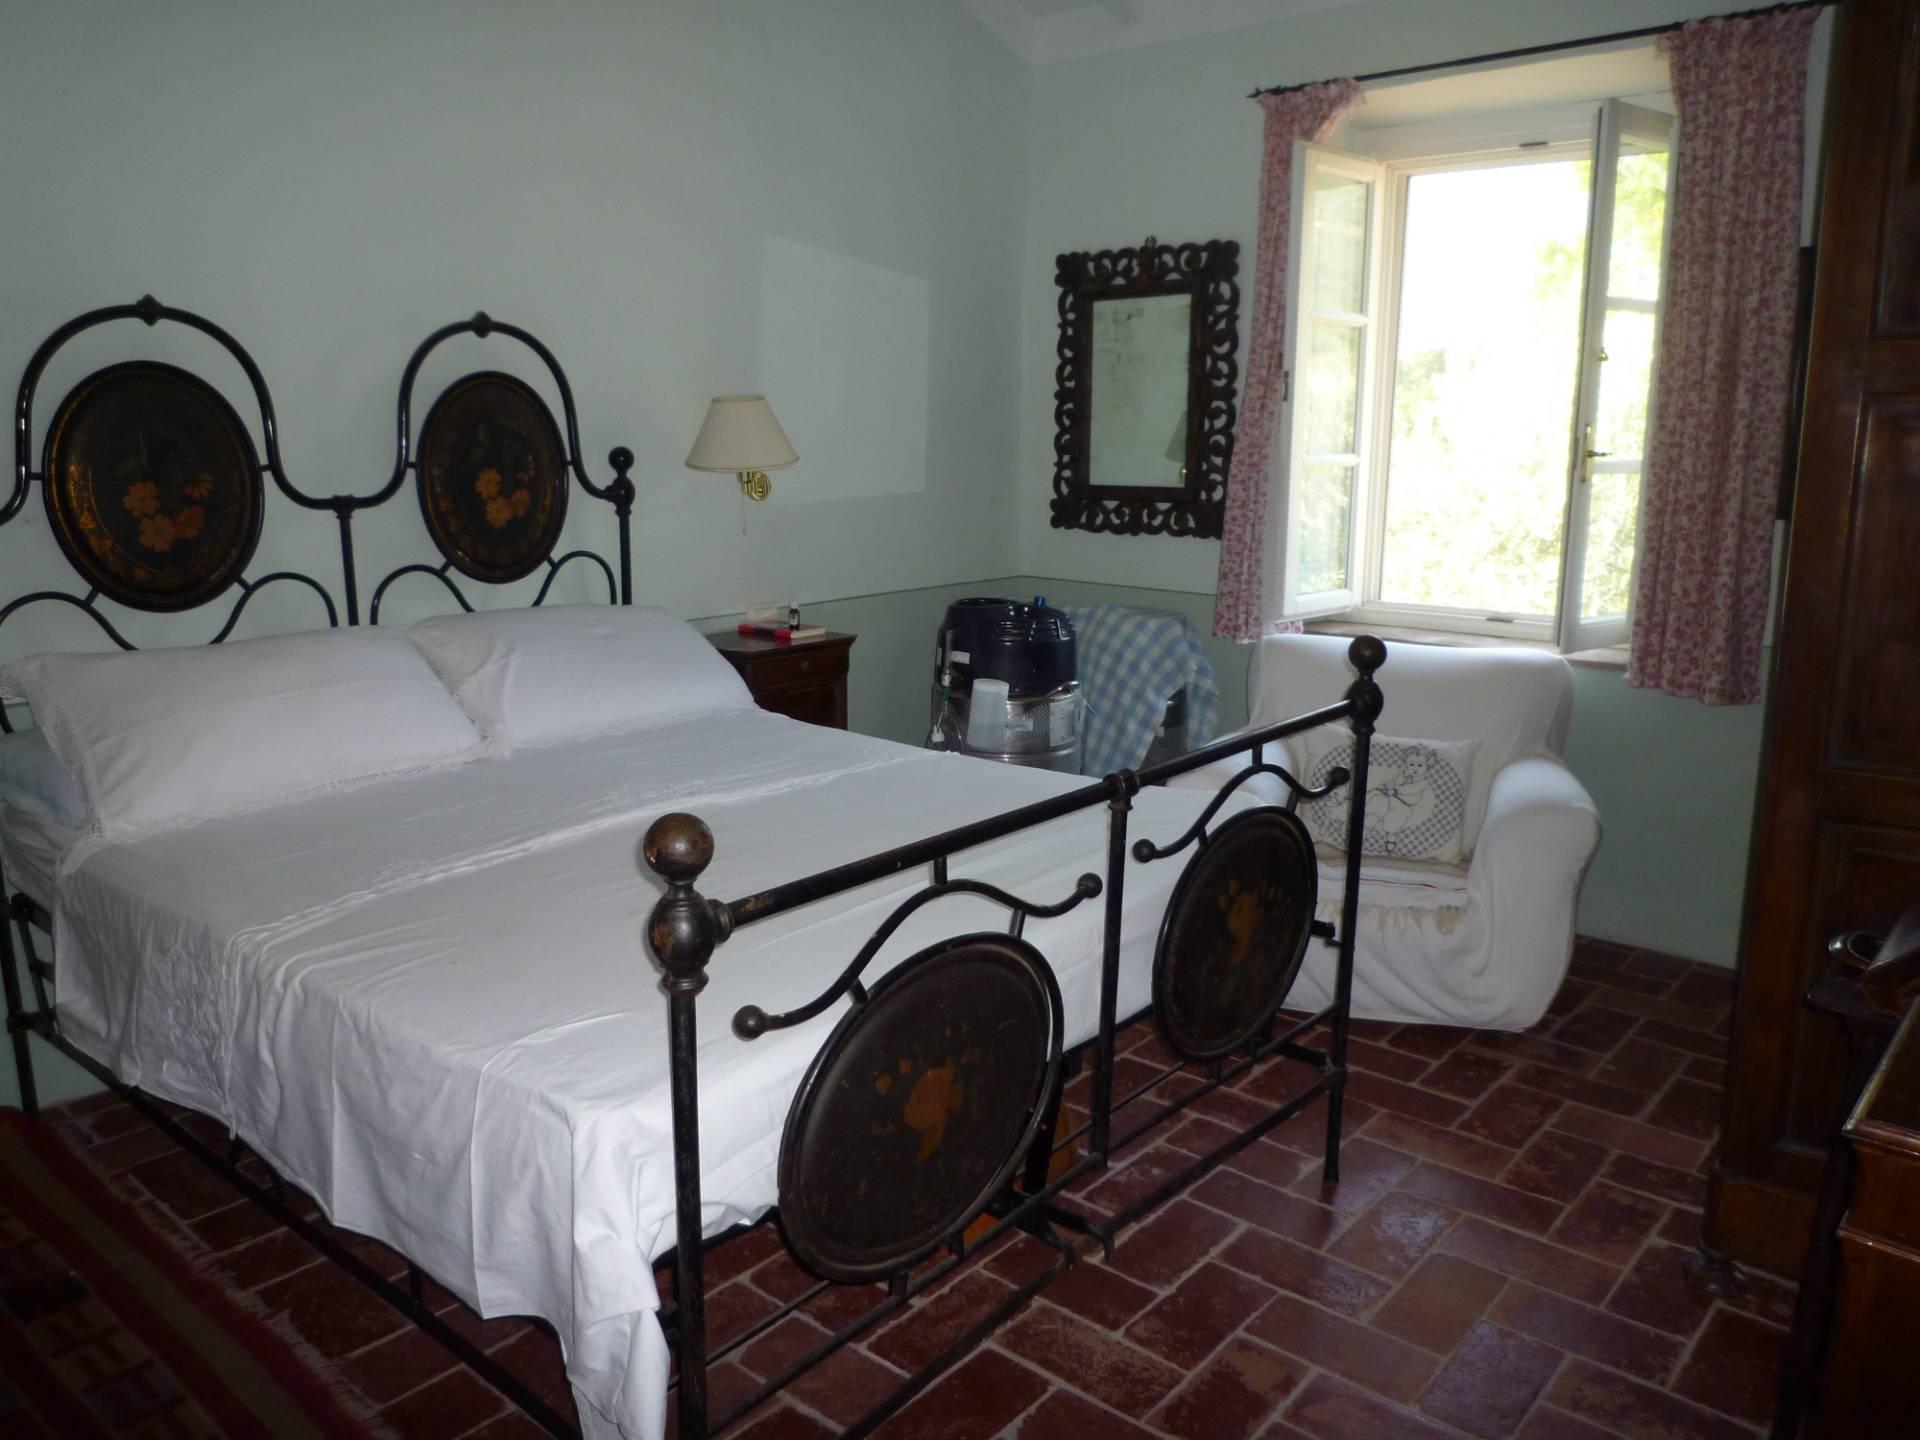 Villa in Vendita a Camaiore: 5 locali, 120 mq - Foto 26